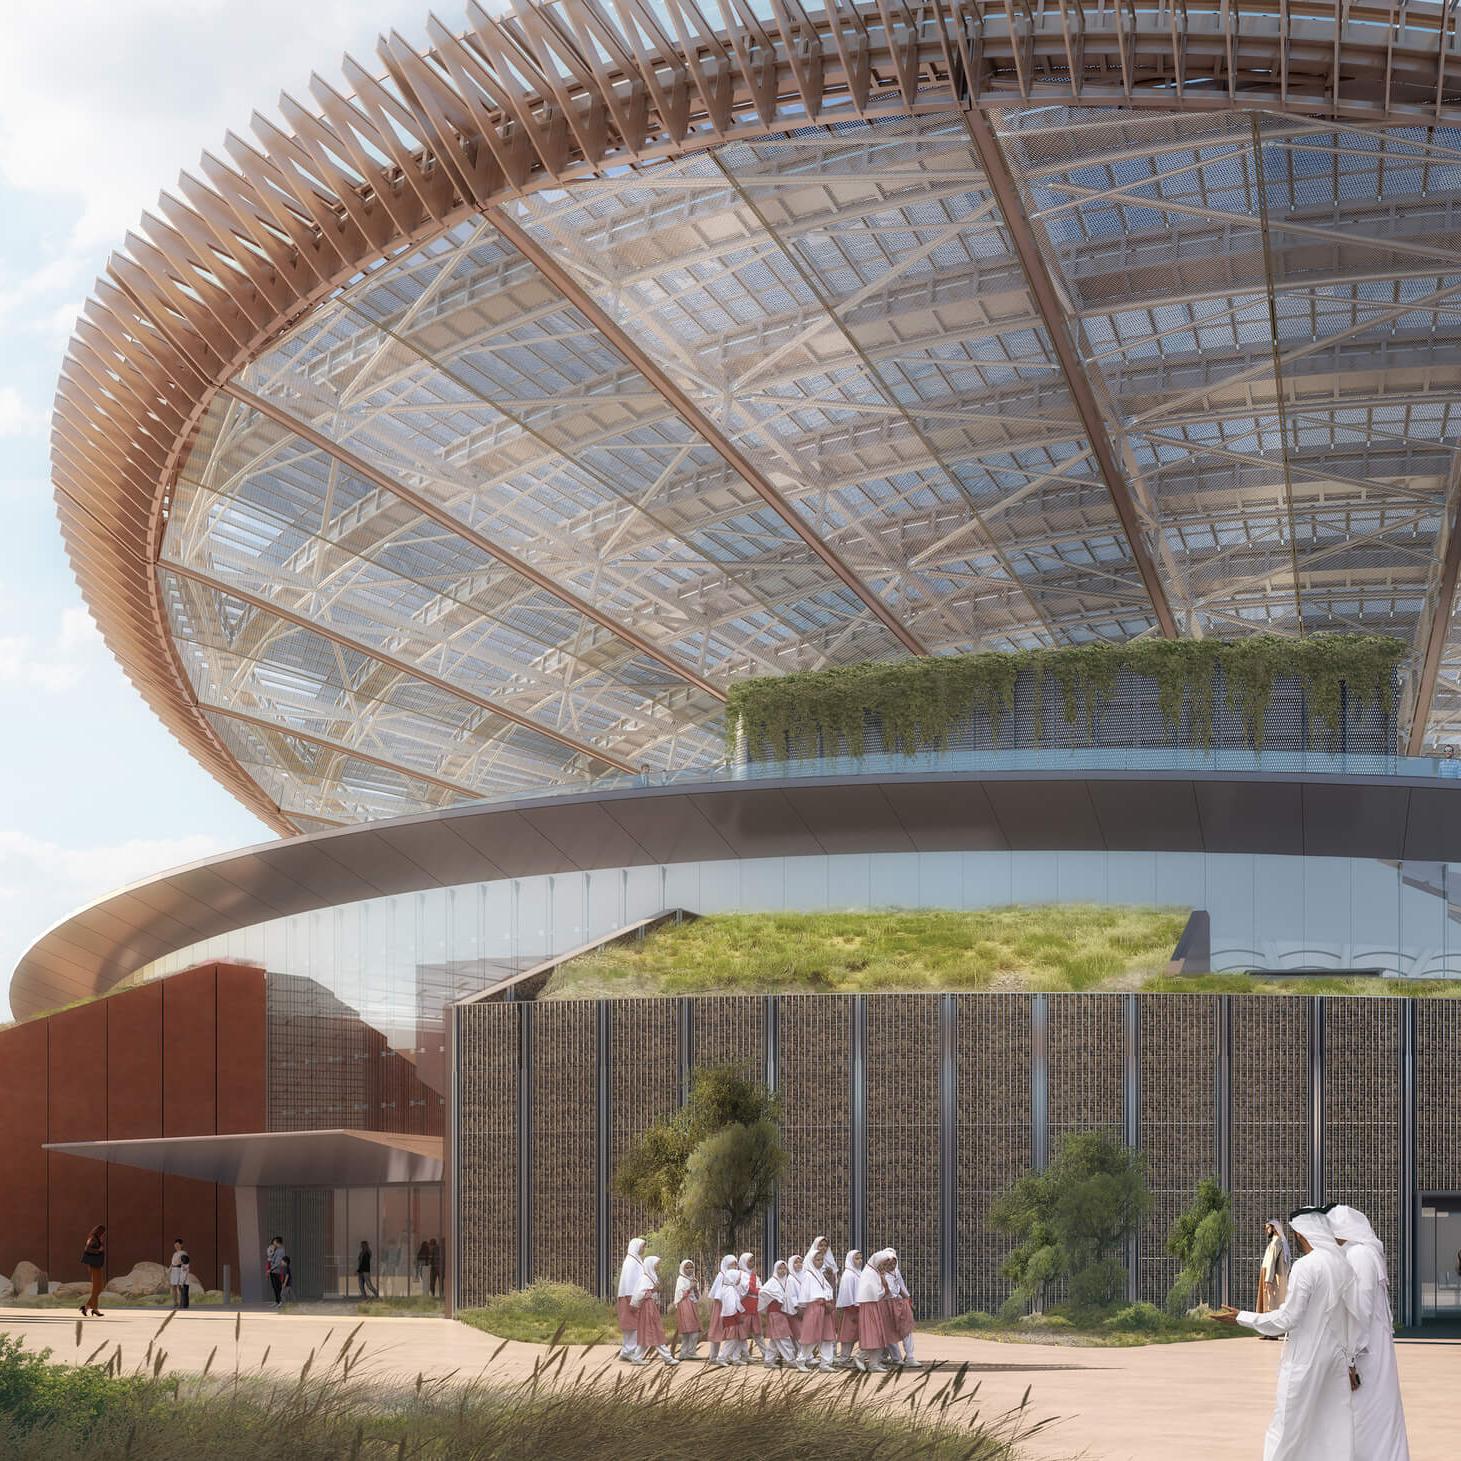 the Dubai Expo 2020 - Sustainability Pavilion 1 - square